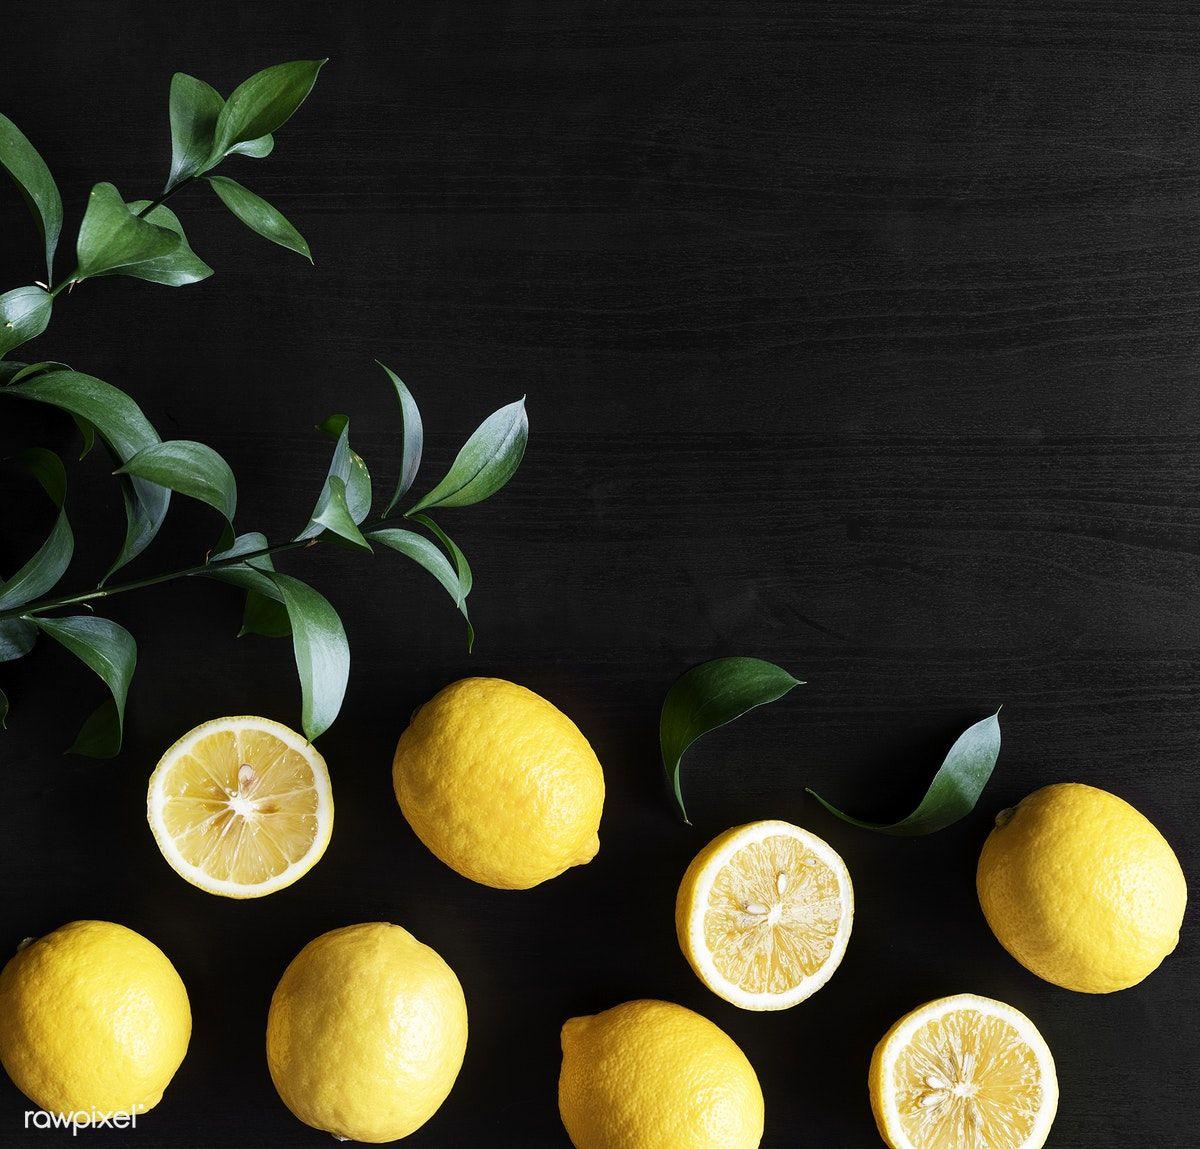 Download Premium Image Of Fresh Yellow Lemons On Black Background